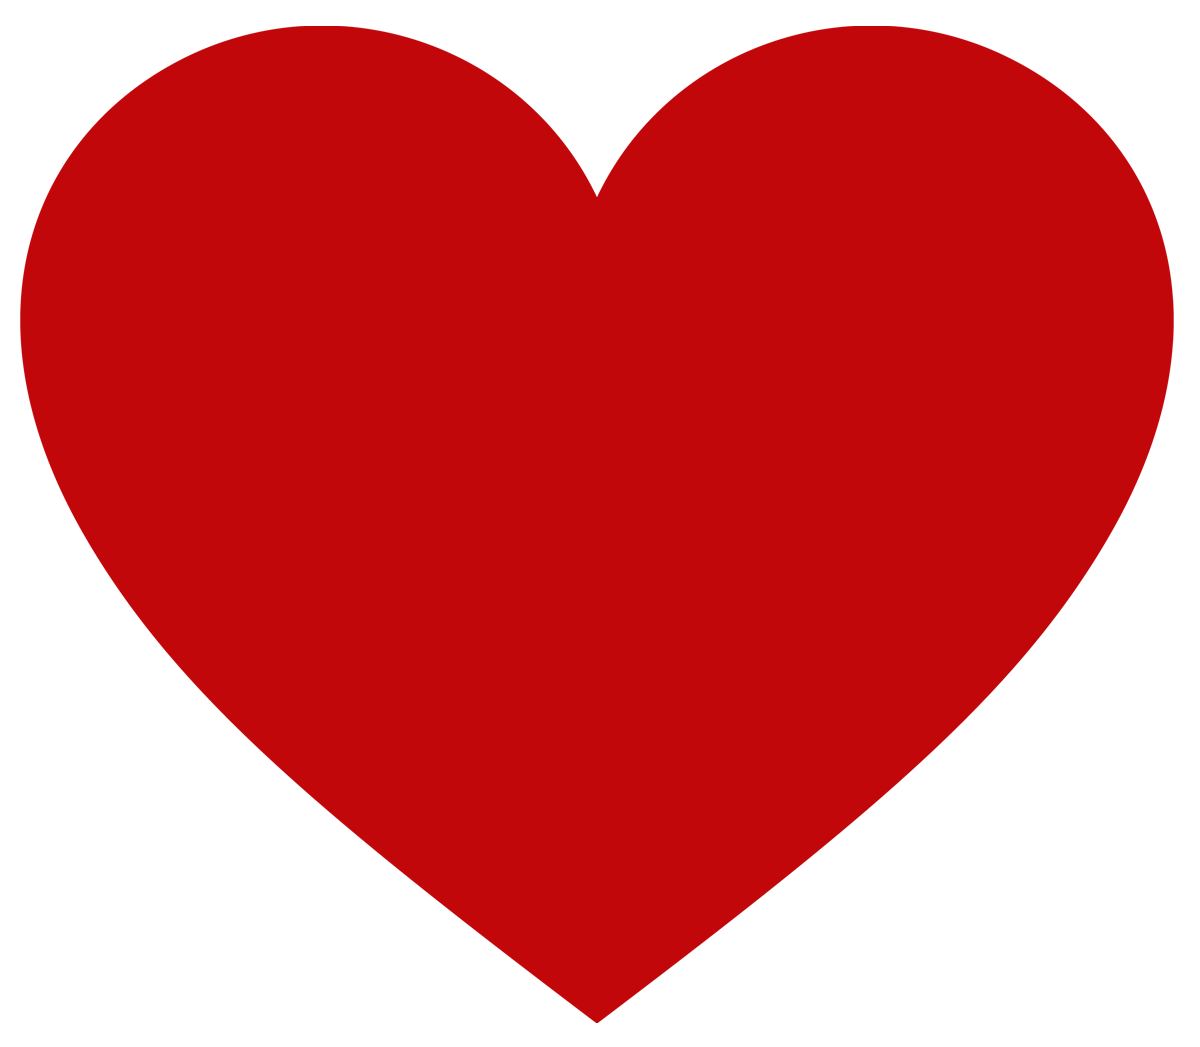 Free Love Art Cliparts, Download Free Clip Art, Free Clip.